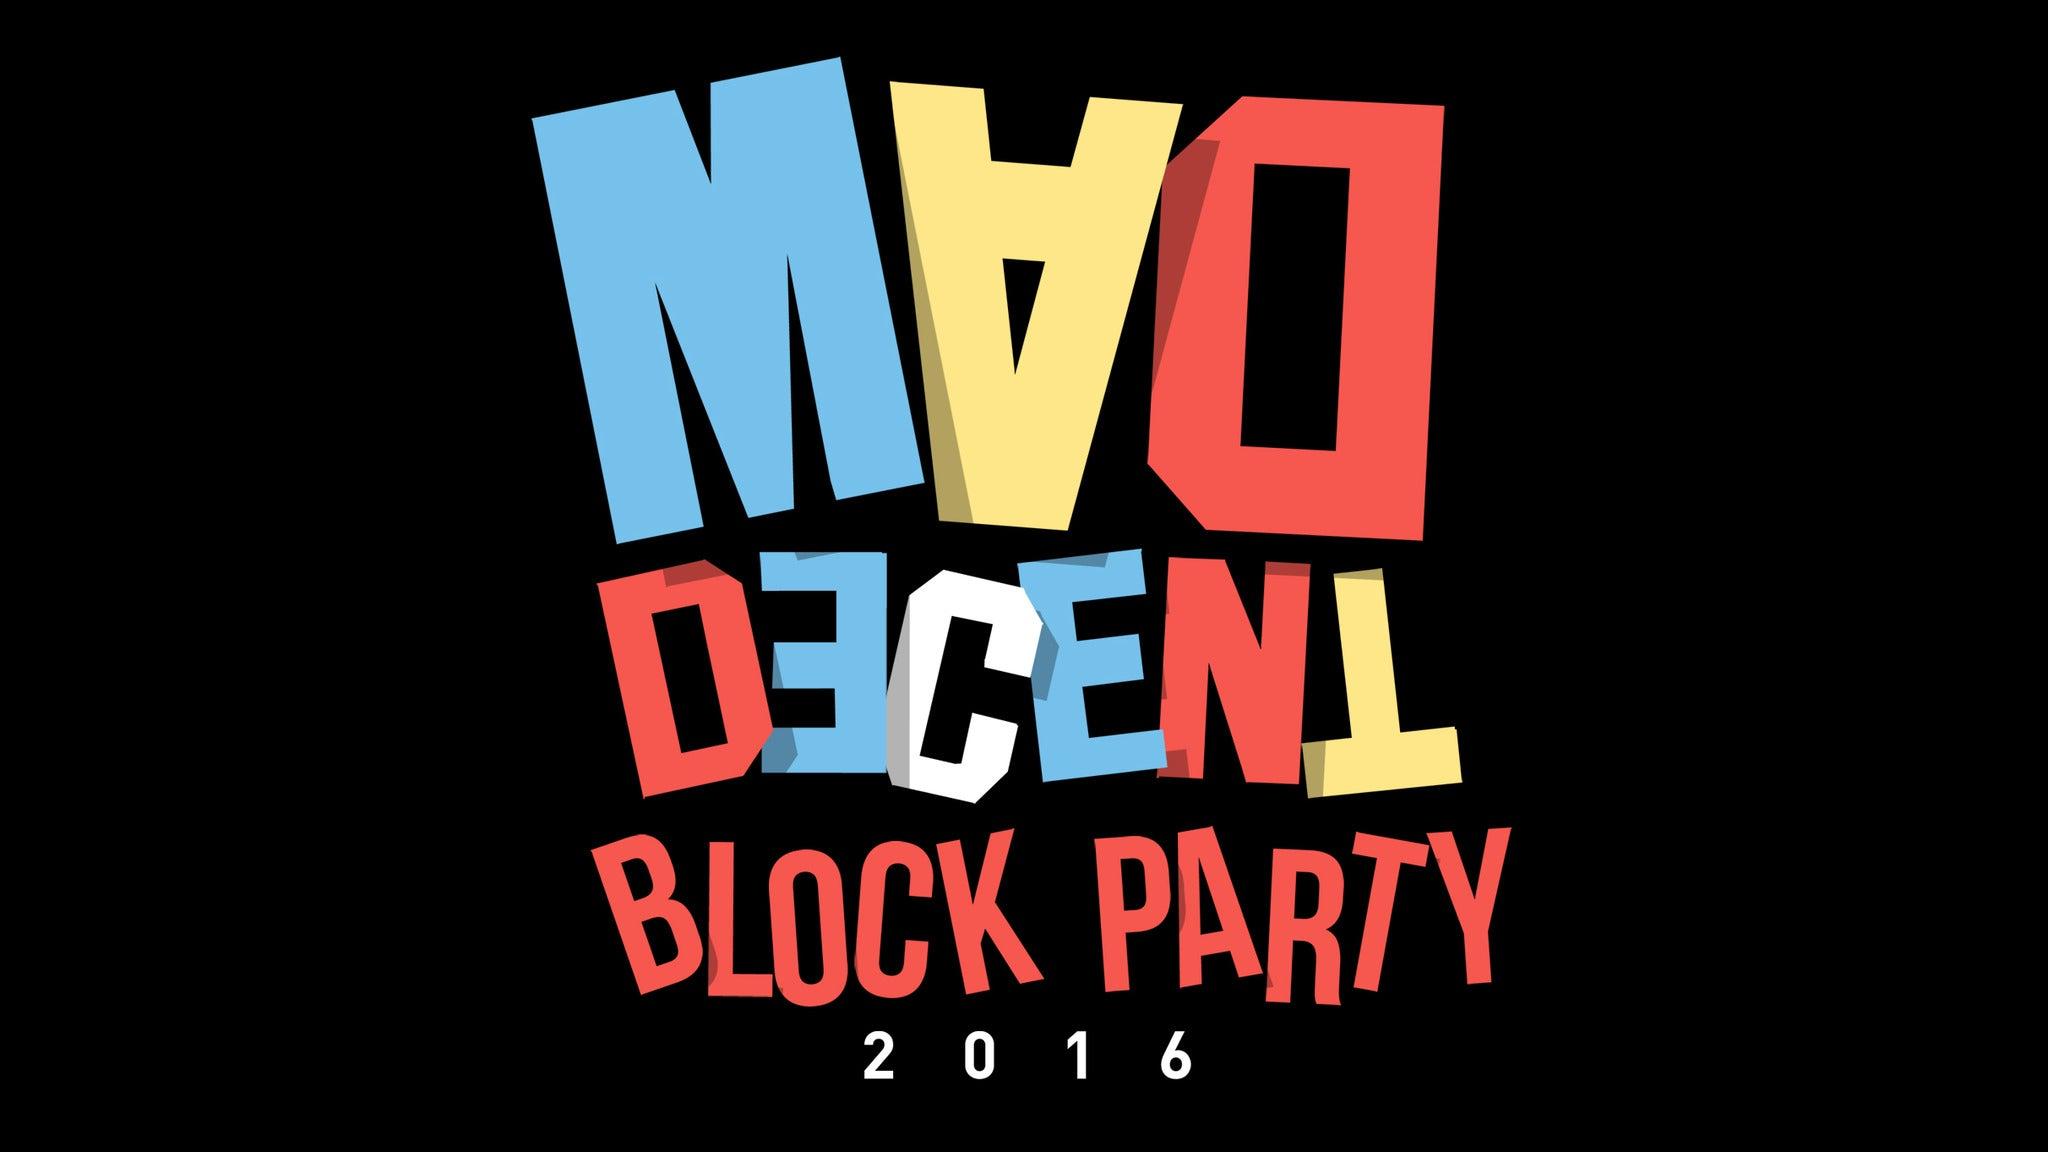 Mad Decent Block Party at Revolution Live